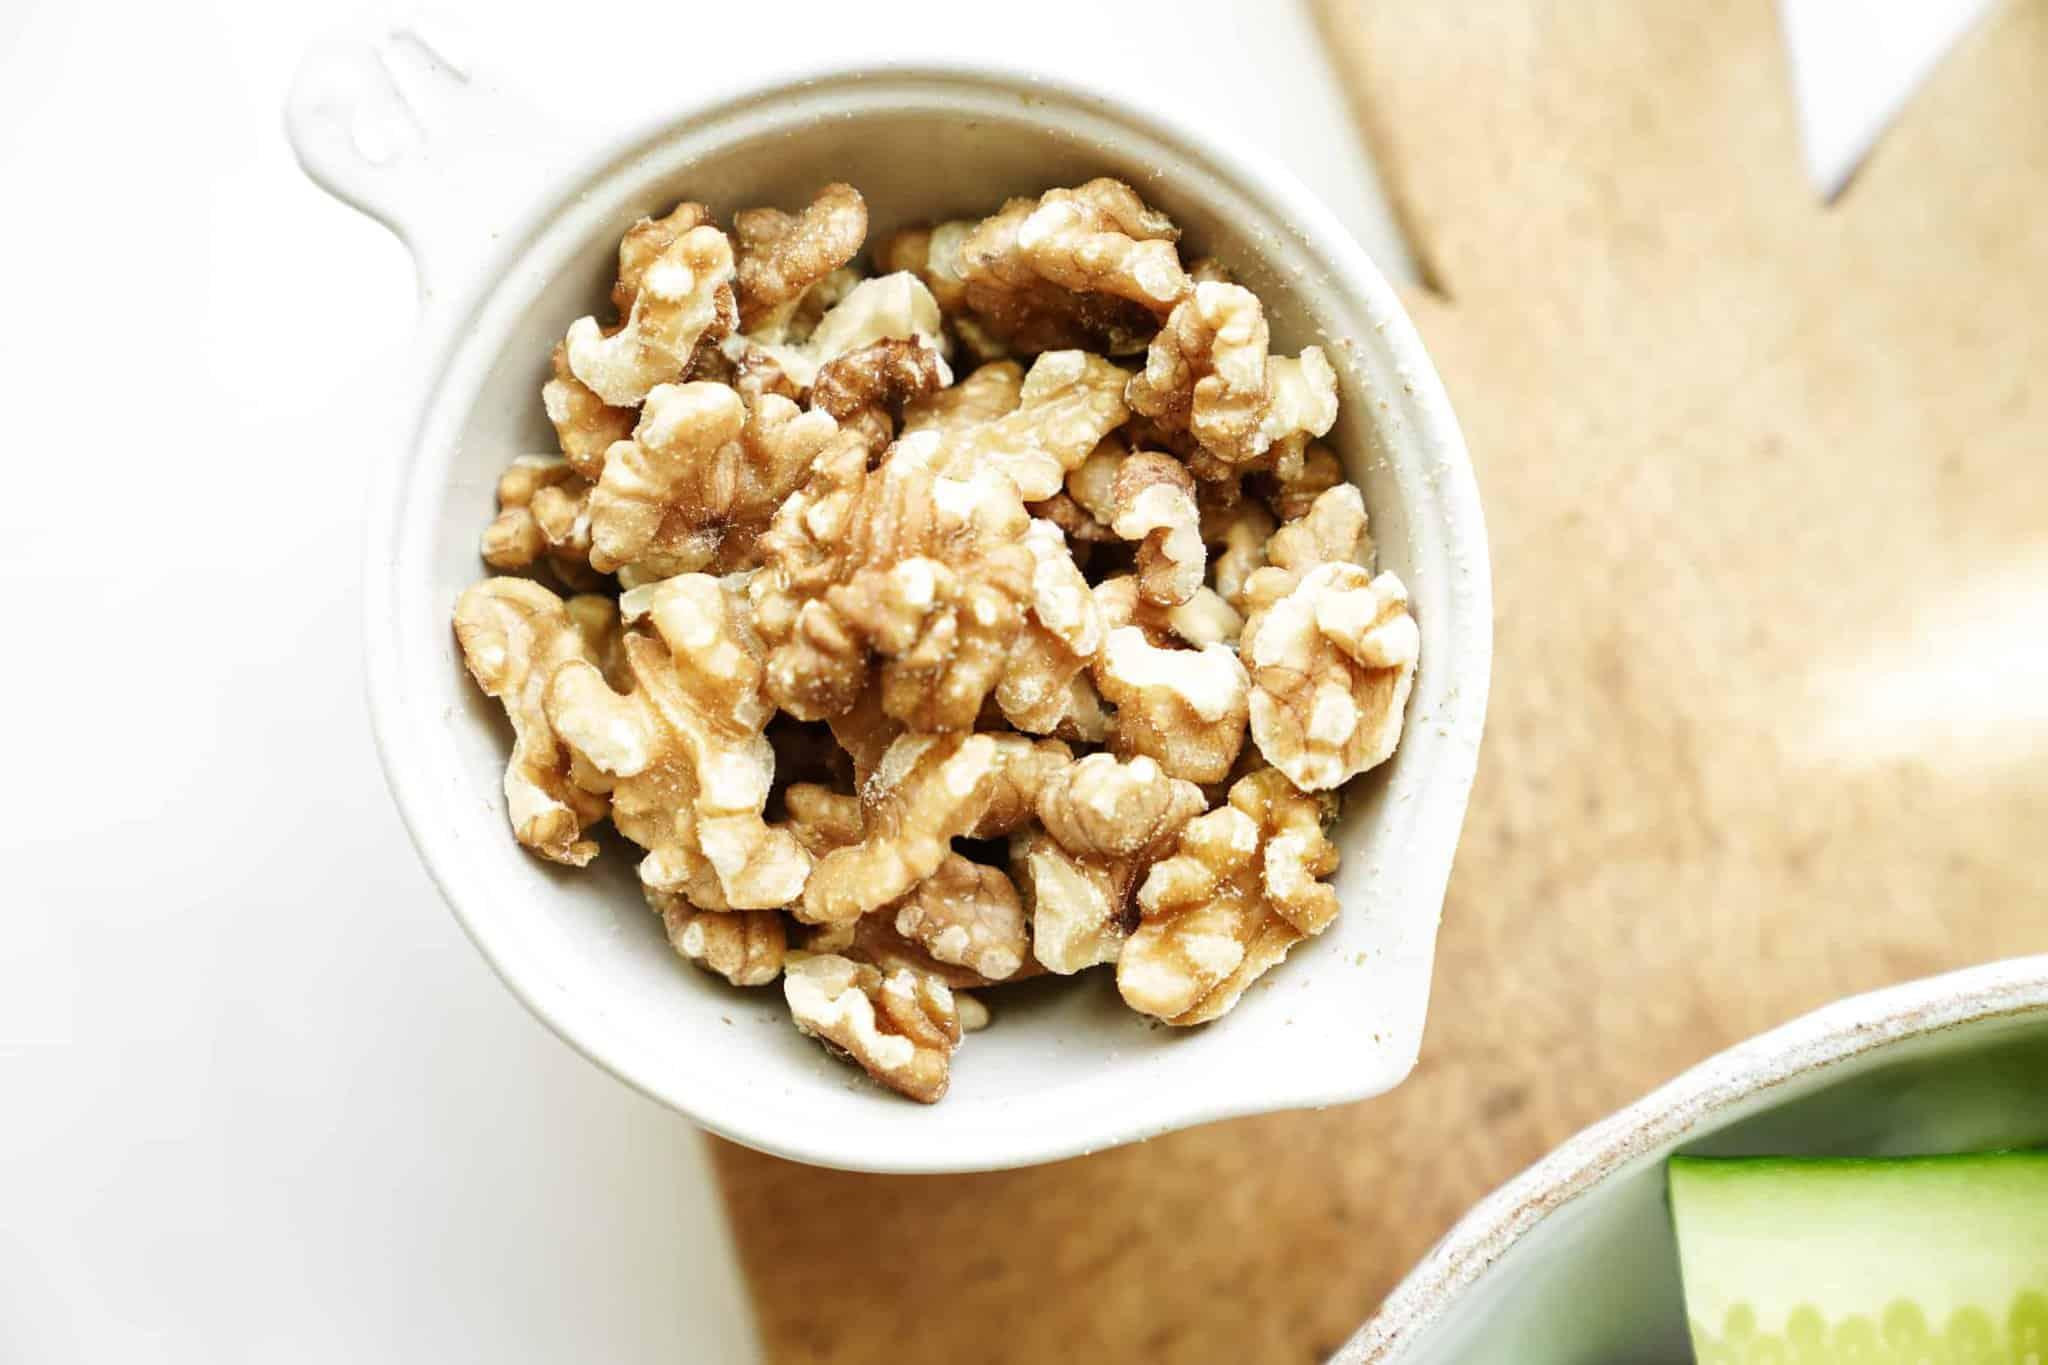 Walnuts in a serving dish